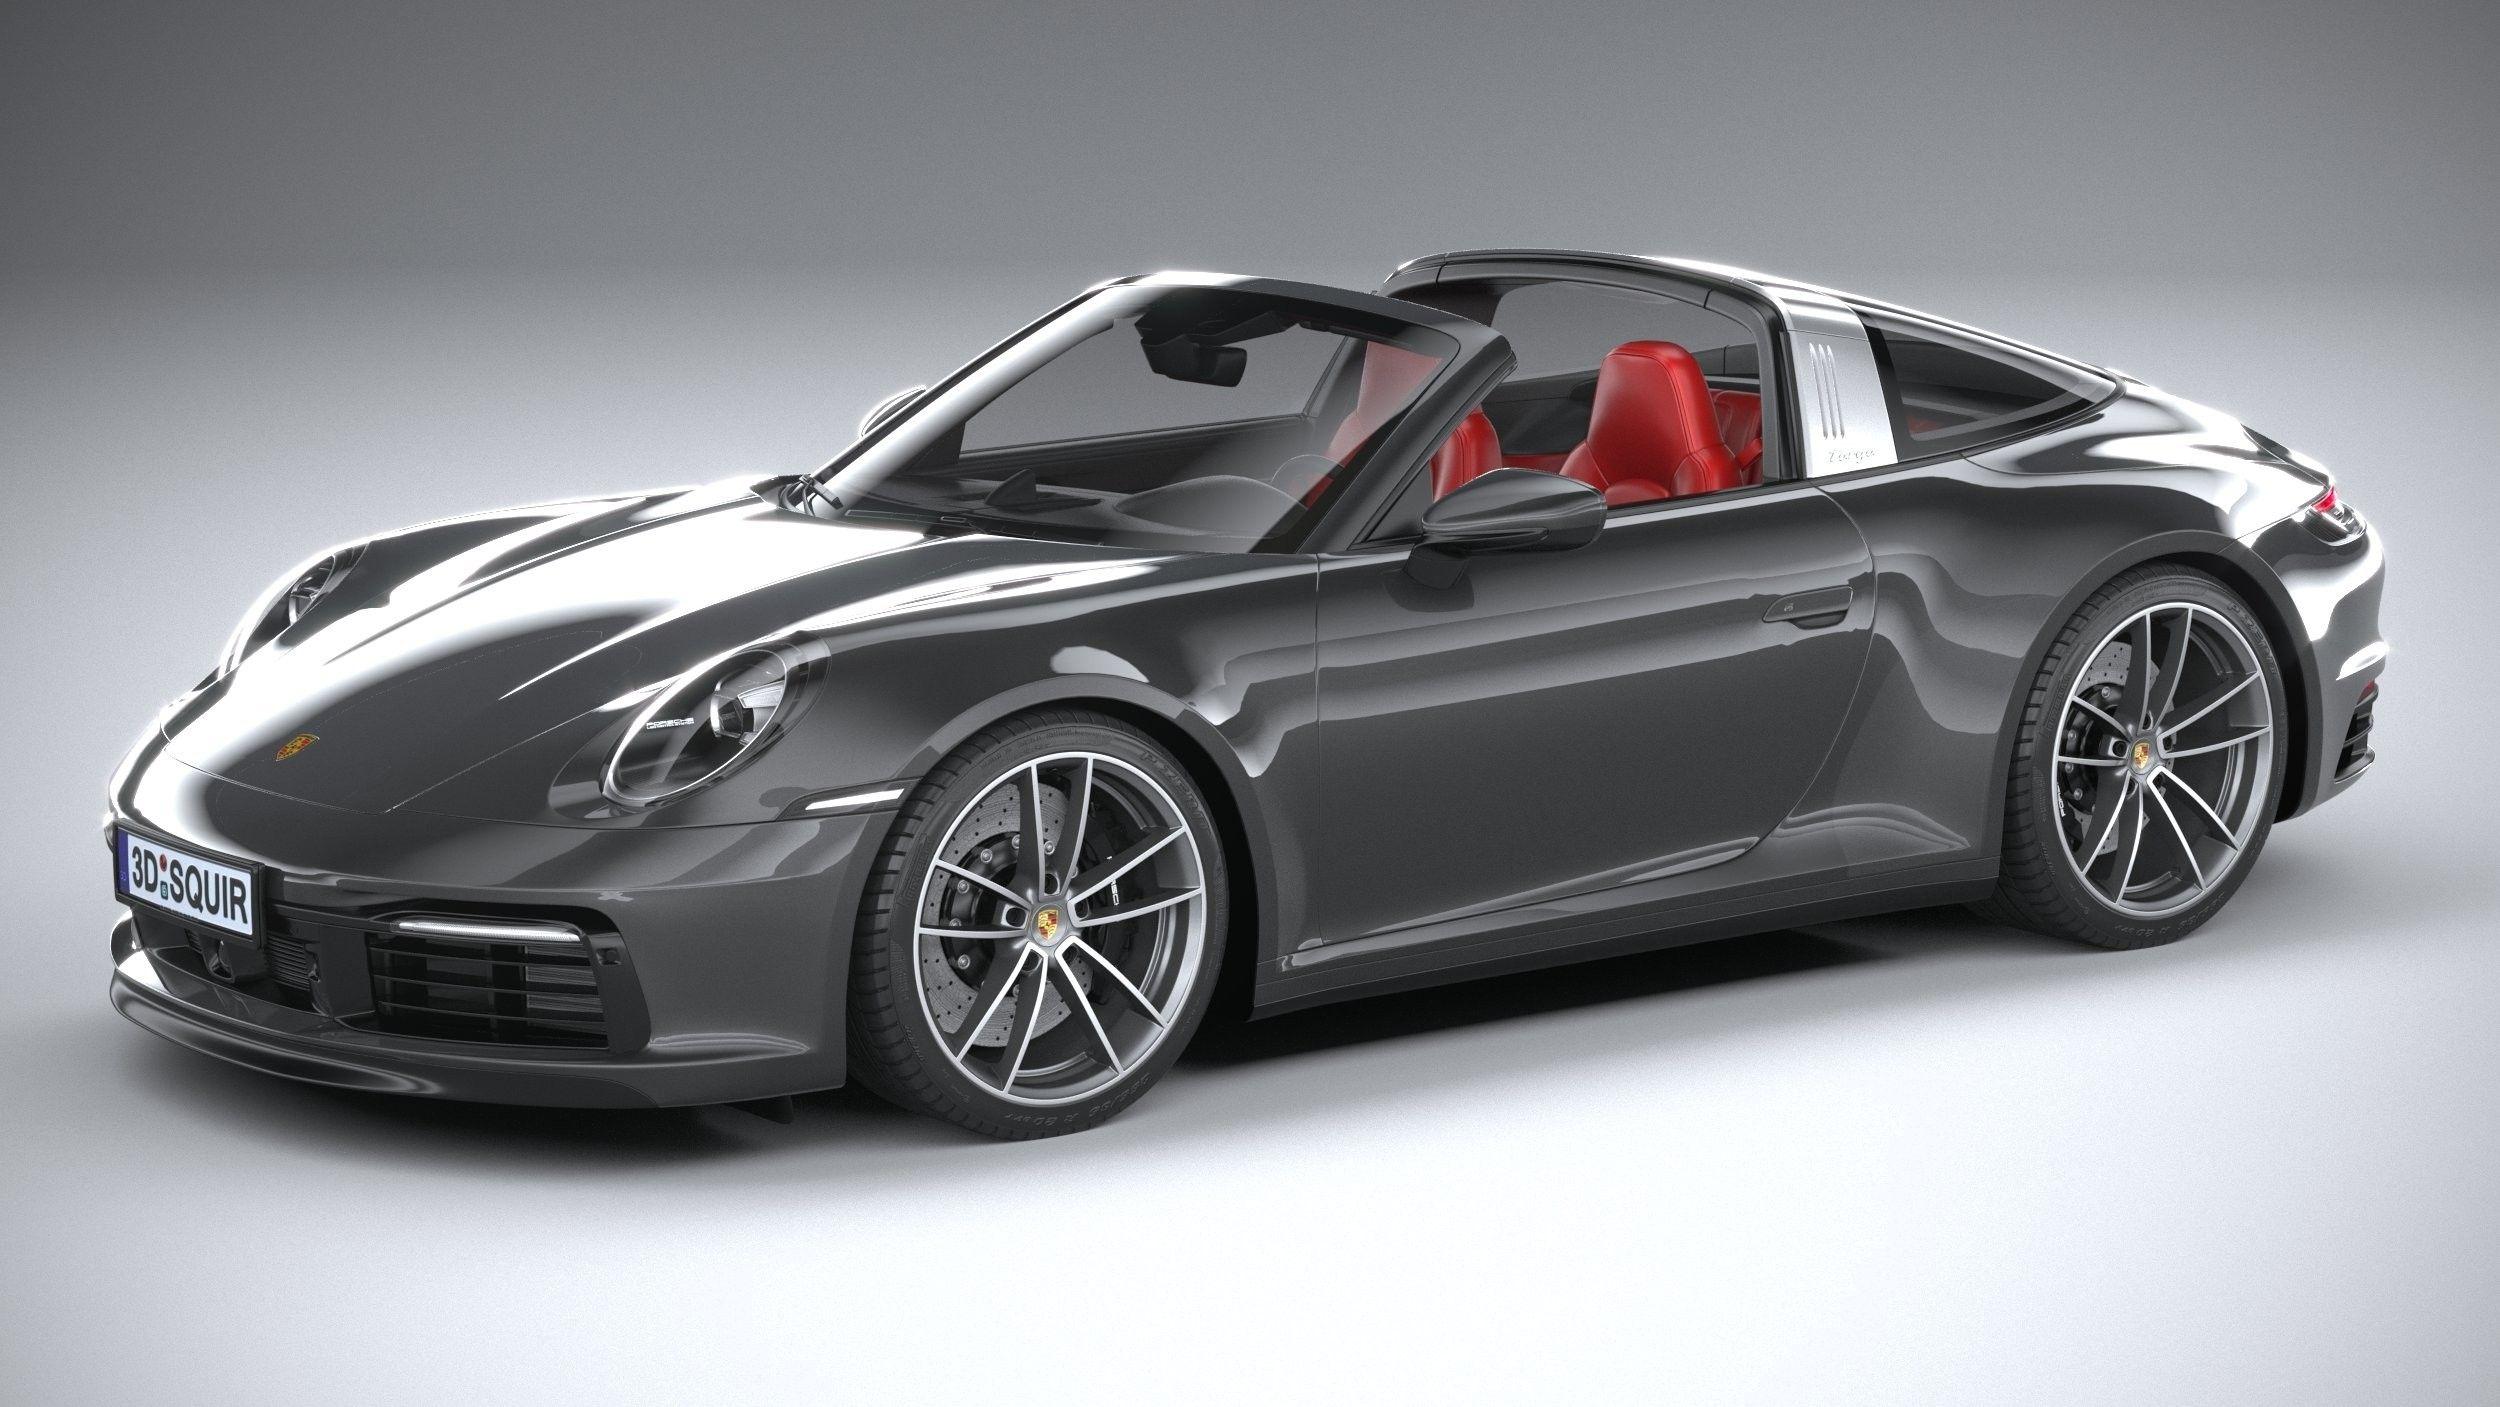 Pin By Viktor Buttl On Kocsik Porsche 911 Targa Porsche 911 Porsche 911 Targa 4s